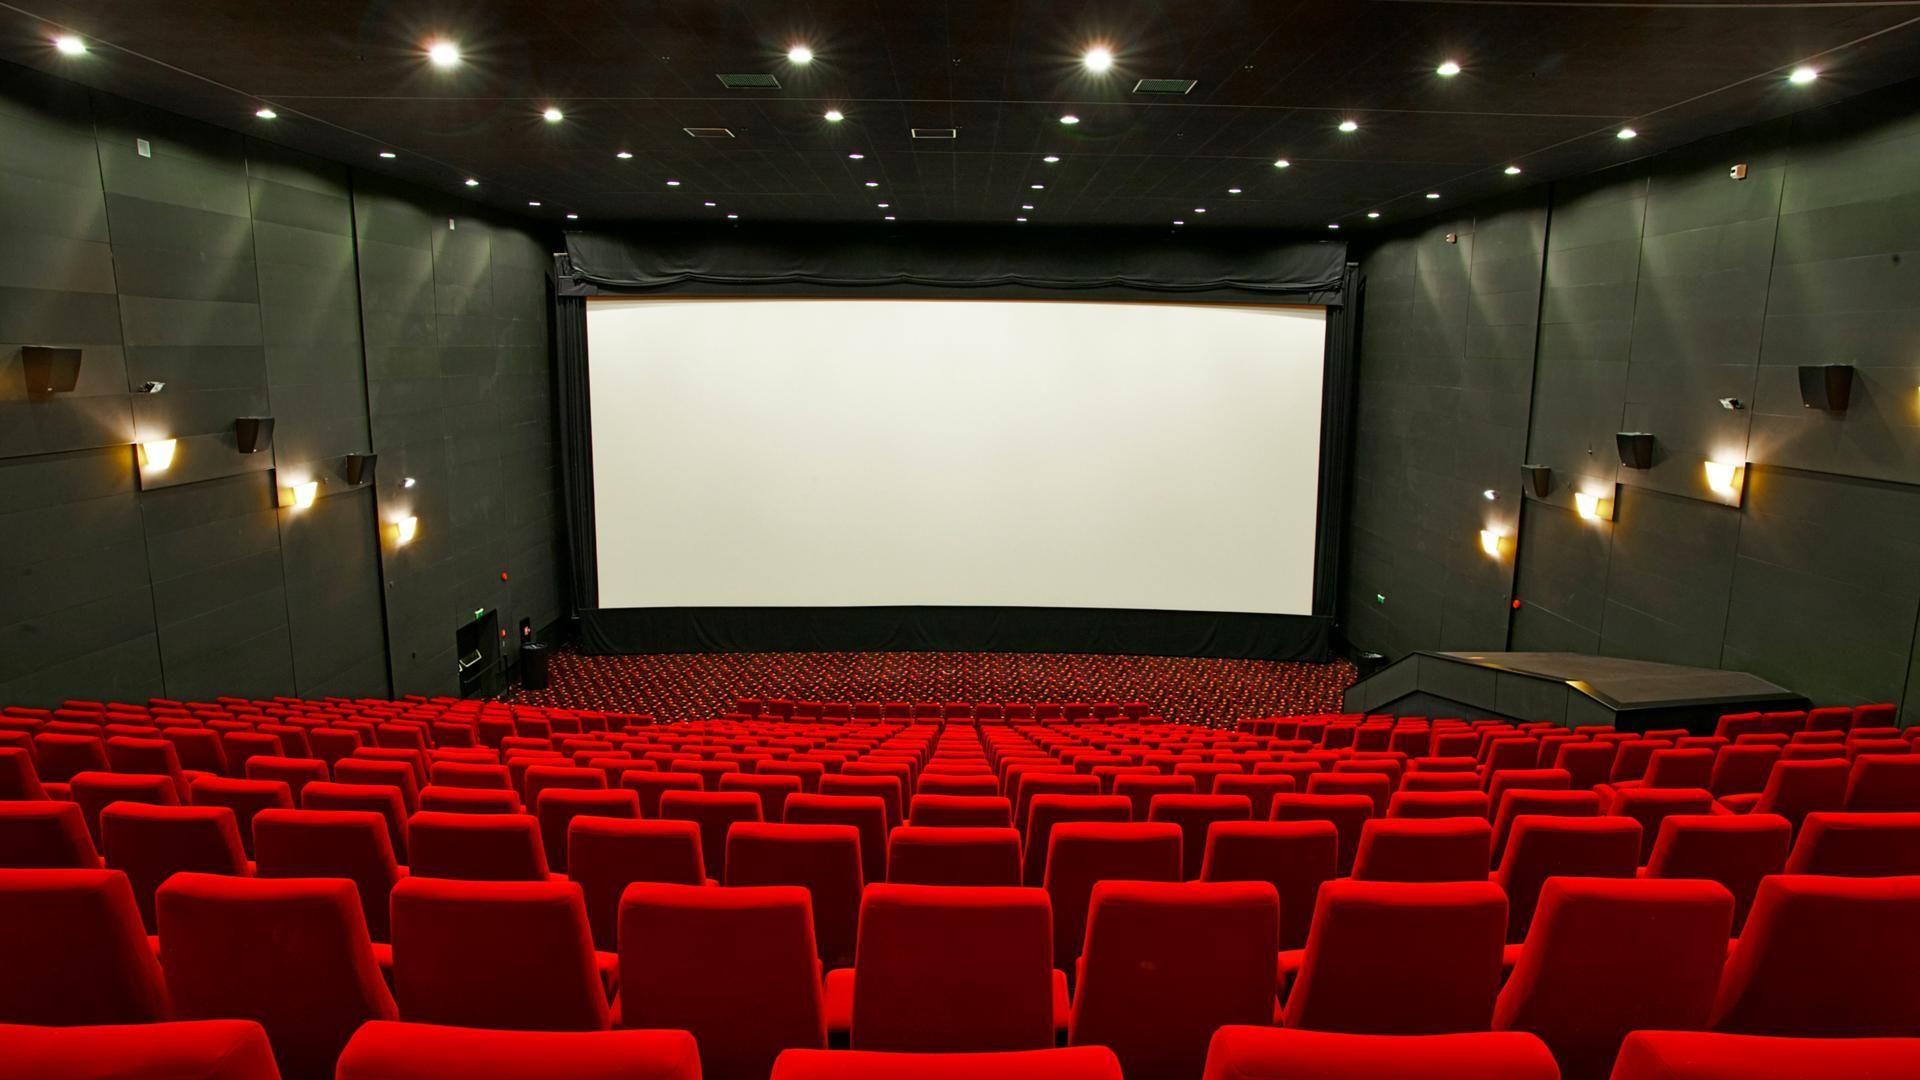 Movie Theater 1080p Wallpaper